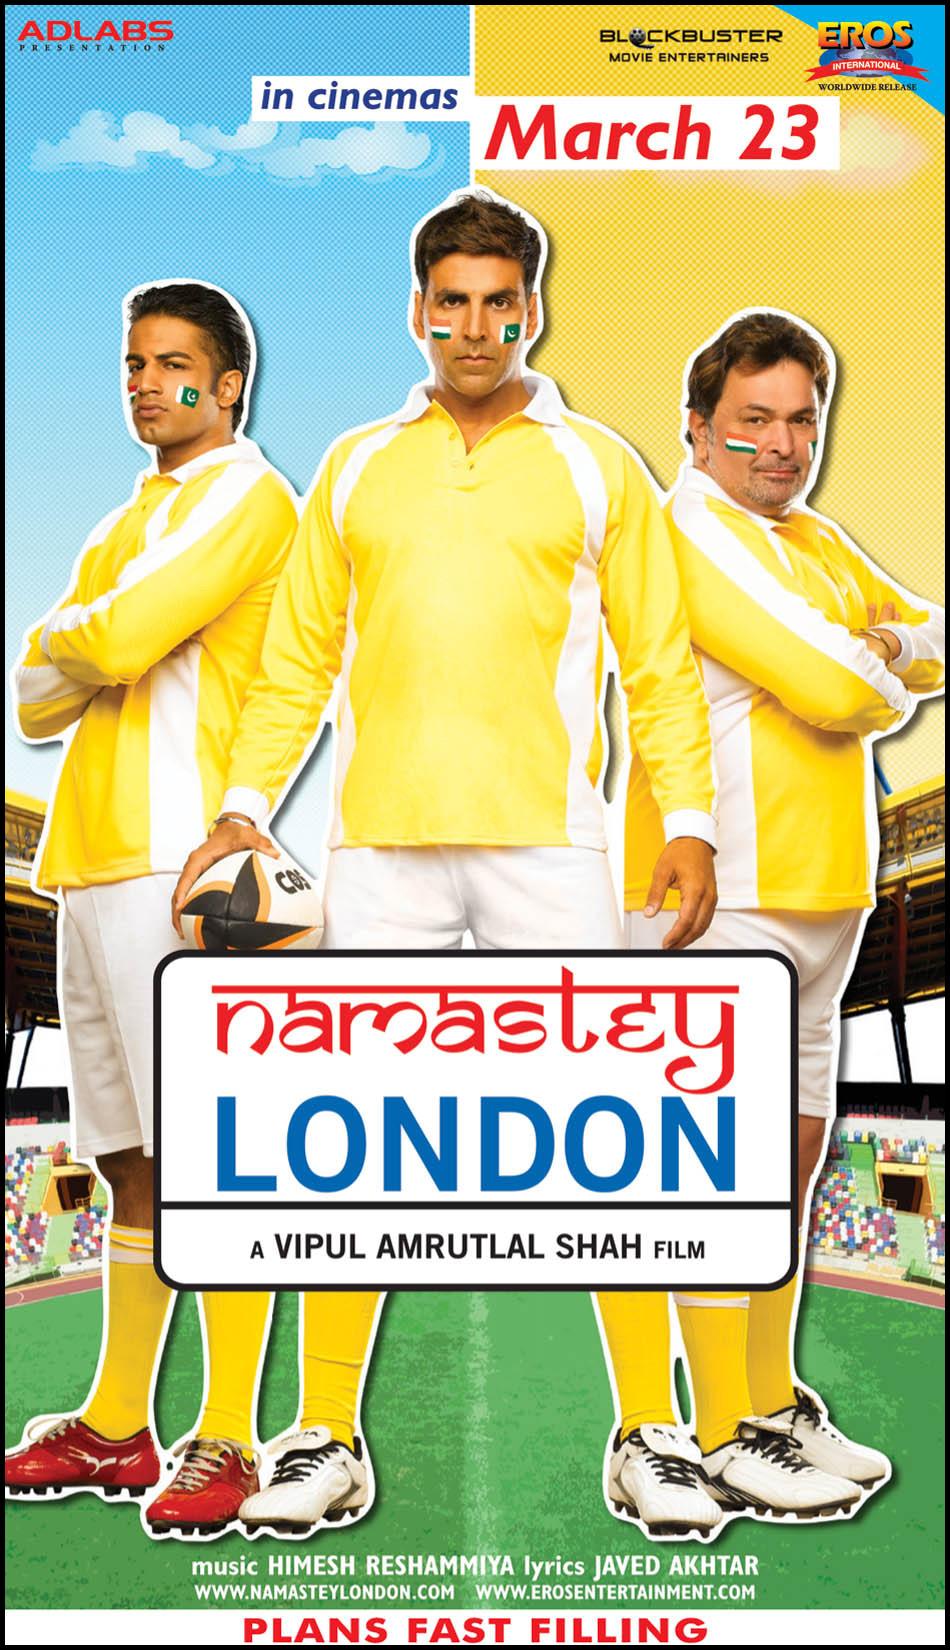 namastey london Listen to all namastey london vol 1 songs now on saavn 2007 hindi movie feat akshay kumar, katrina kaif, rishi kapoor, nina wadia, javed sheikh, upen patel, tiffany mulheron, clive standen.